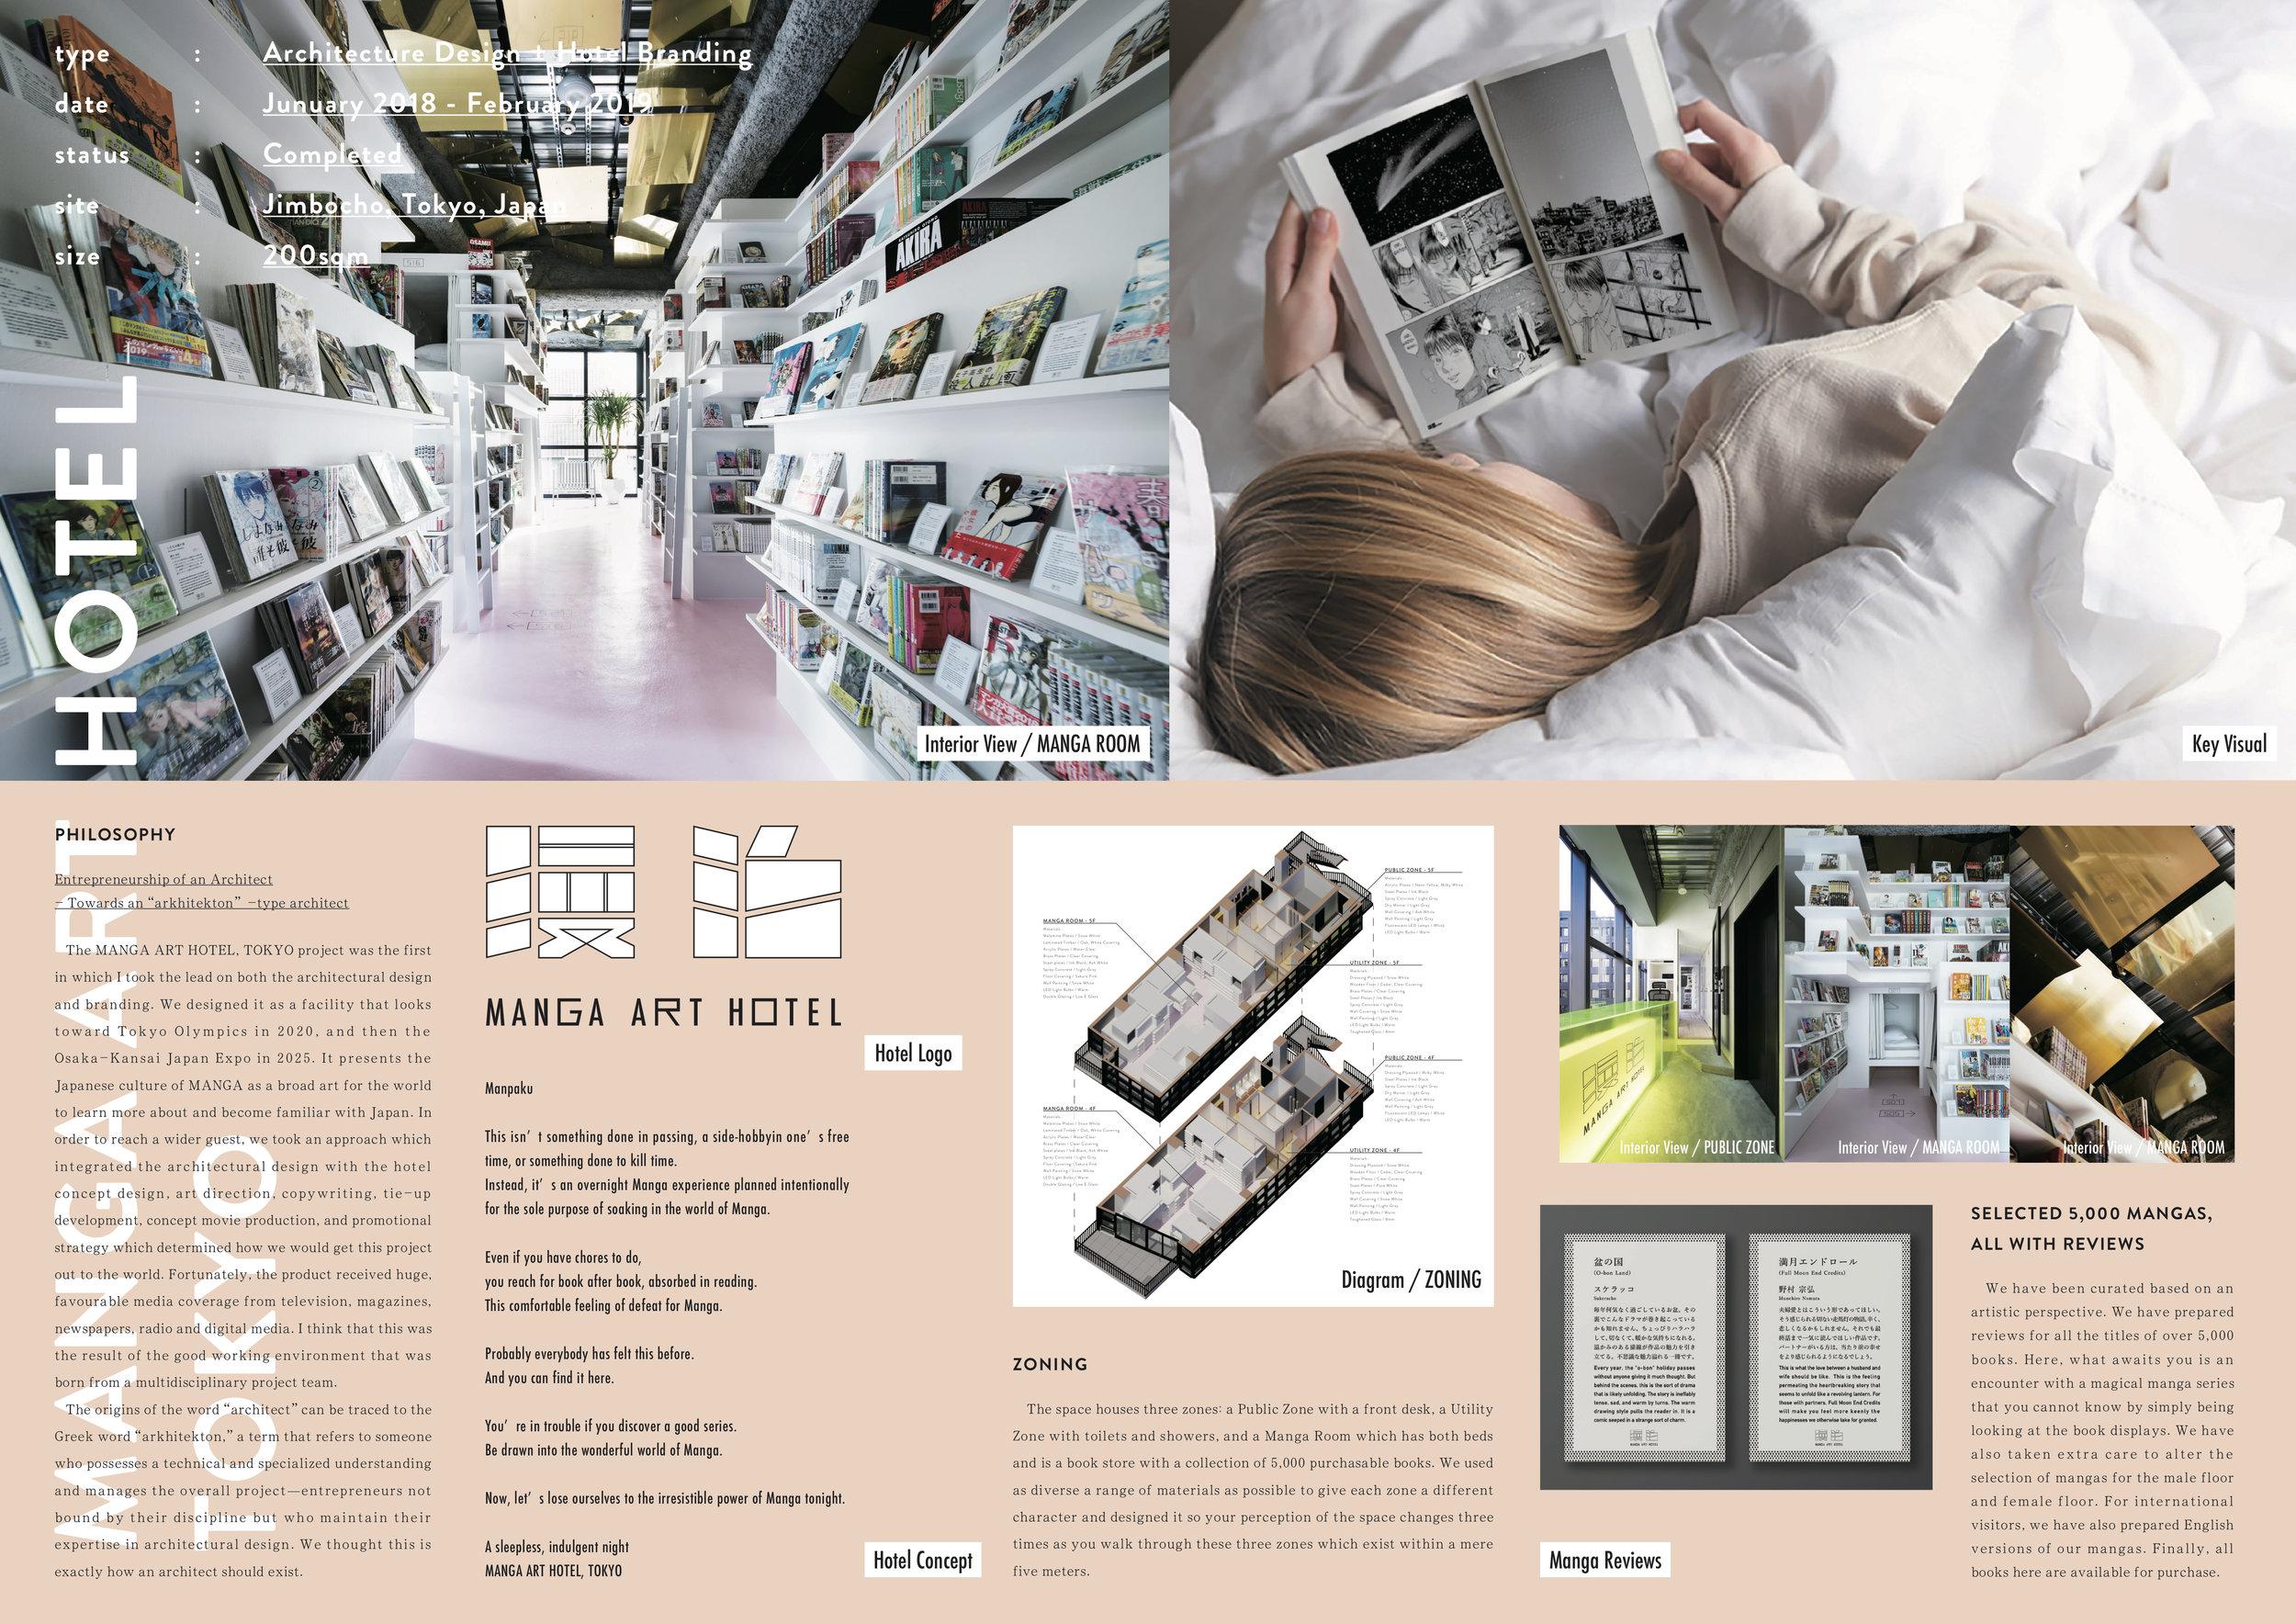 MANGA ART HOTEL, TOKYO - Design by: TAN YAMANOUCHI/ AWGLInterior Division: Hotel & ResortWebsite: https://awgl-inc.com/